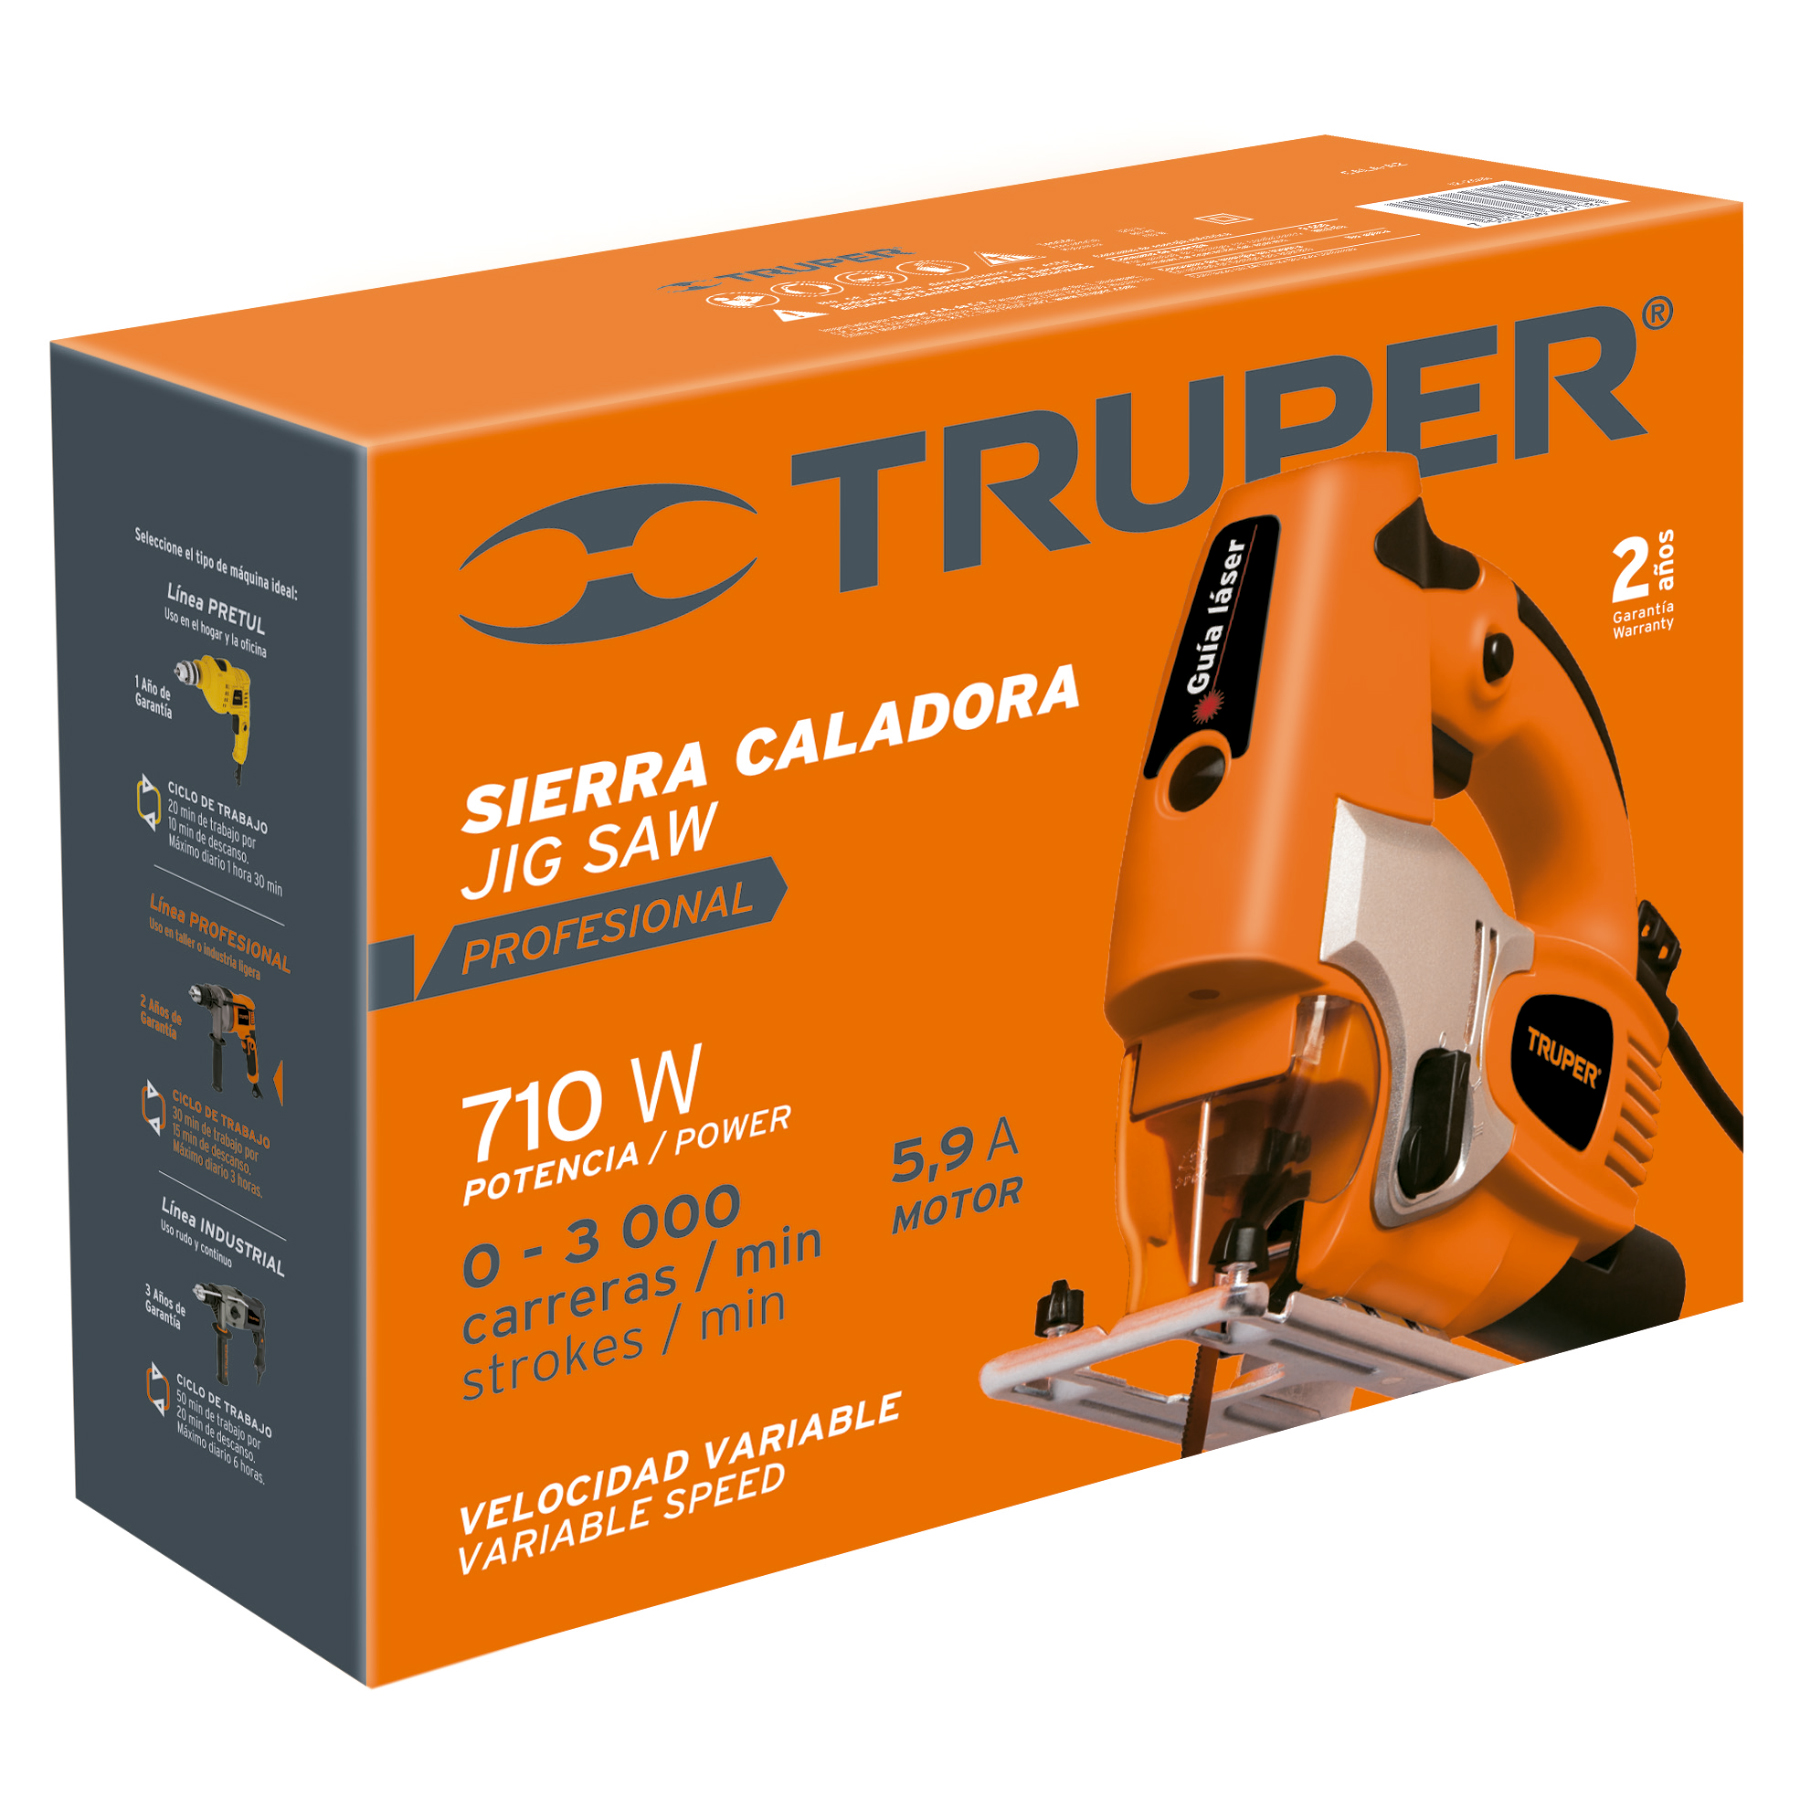 Truper - Sierra caladora, profesional, 710 W, 6A